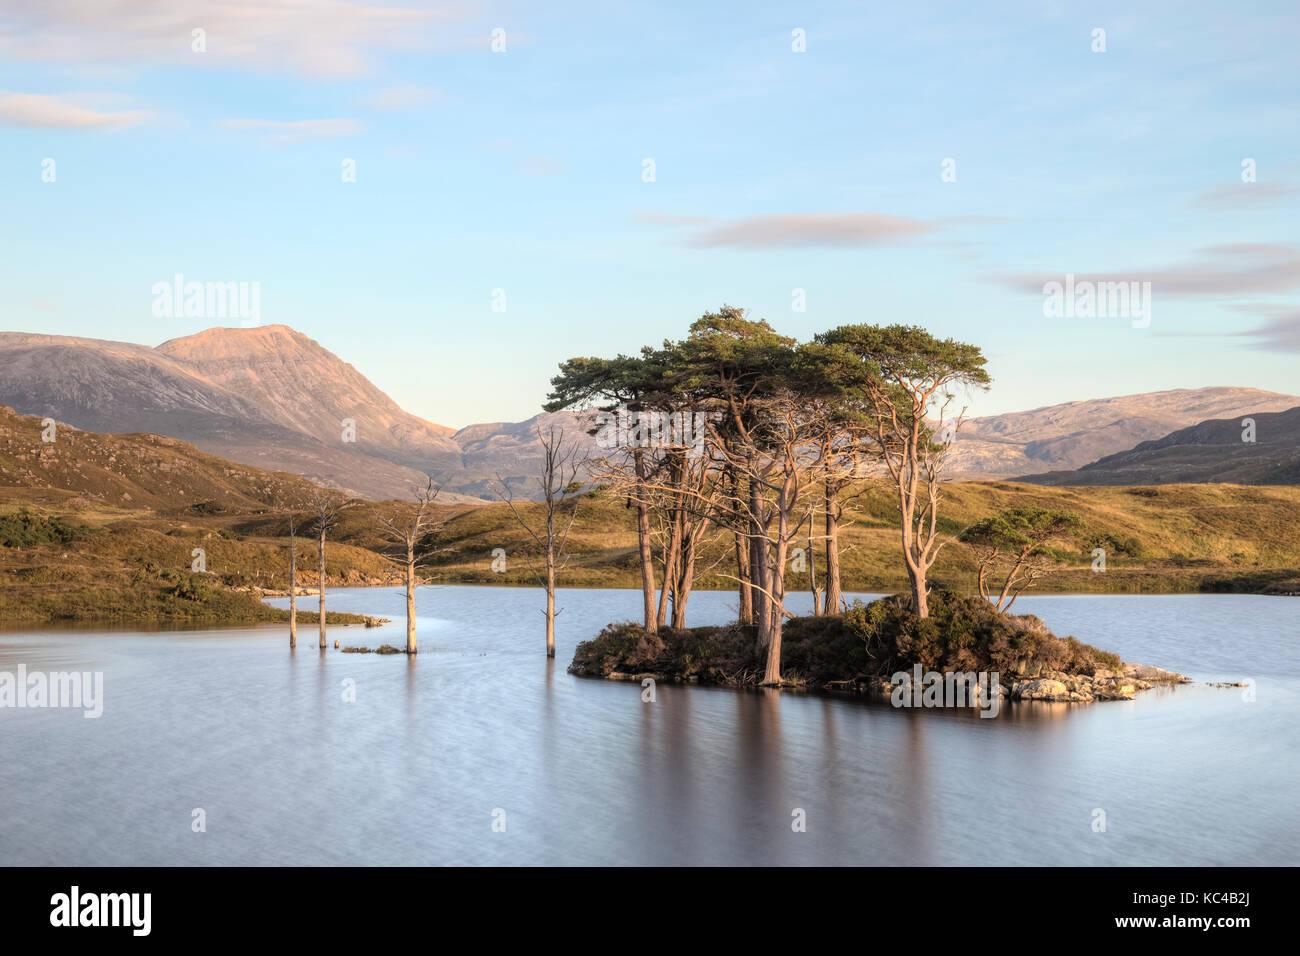 trees submerged at Loch Assynt, Sutherland, Scotland, United Kingdom - Stock Image